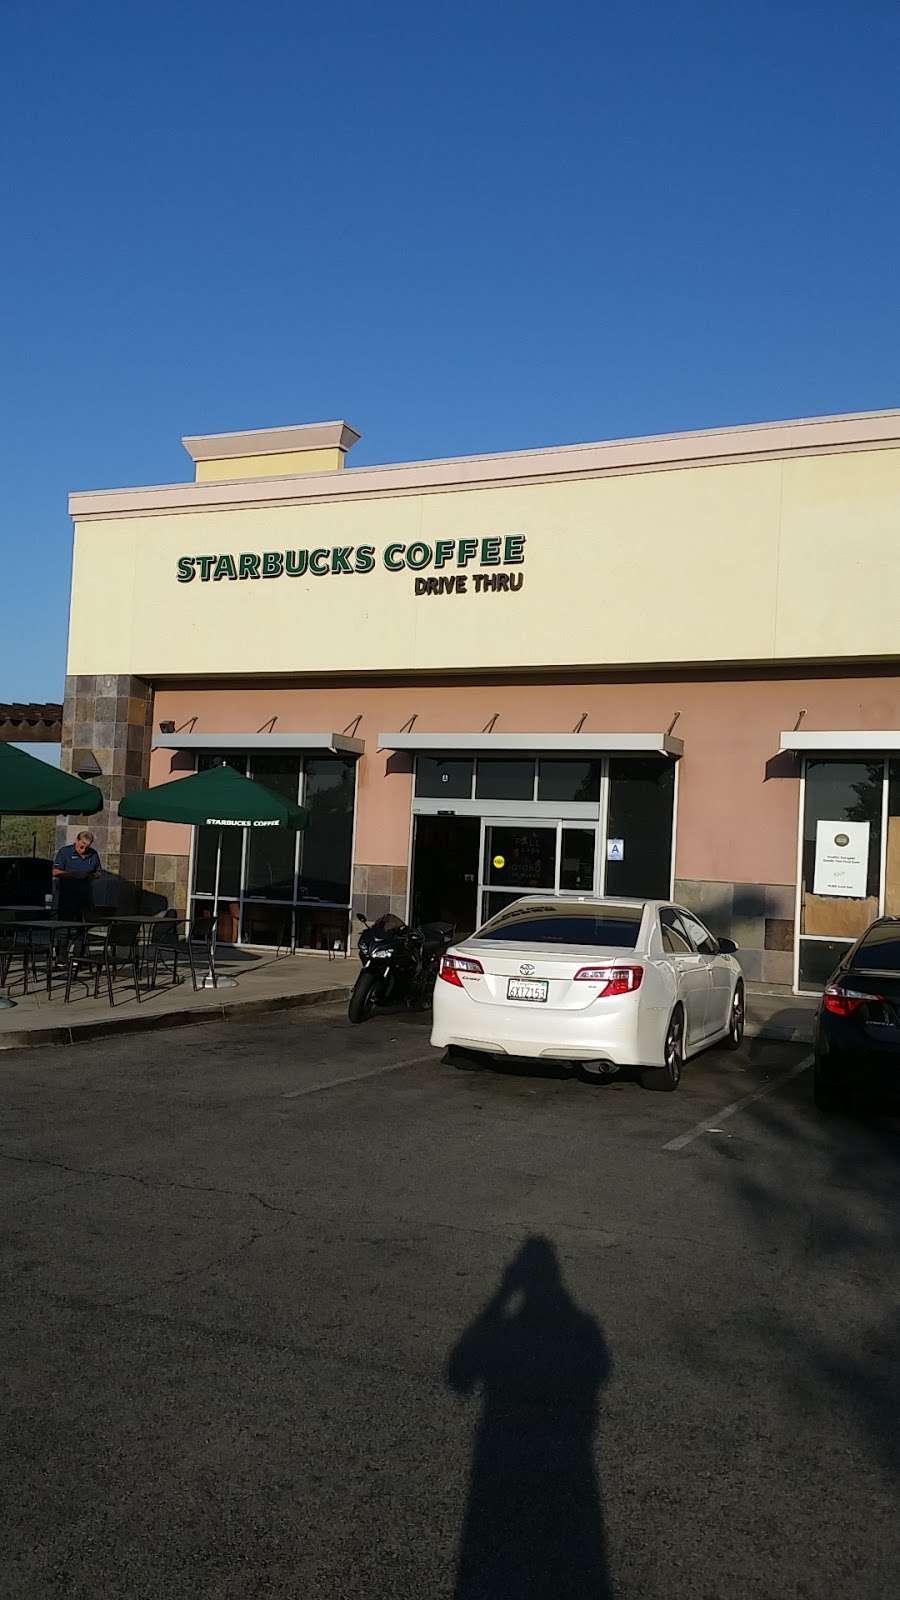 Starbucks - cafe  | Photo 3 of 10 | Address: 4880 E. Motor Lane B, Ontario, CA 91761, USA | Phone: (909) 974-0174